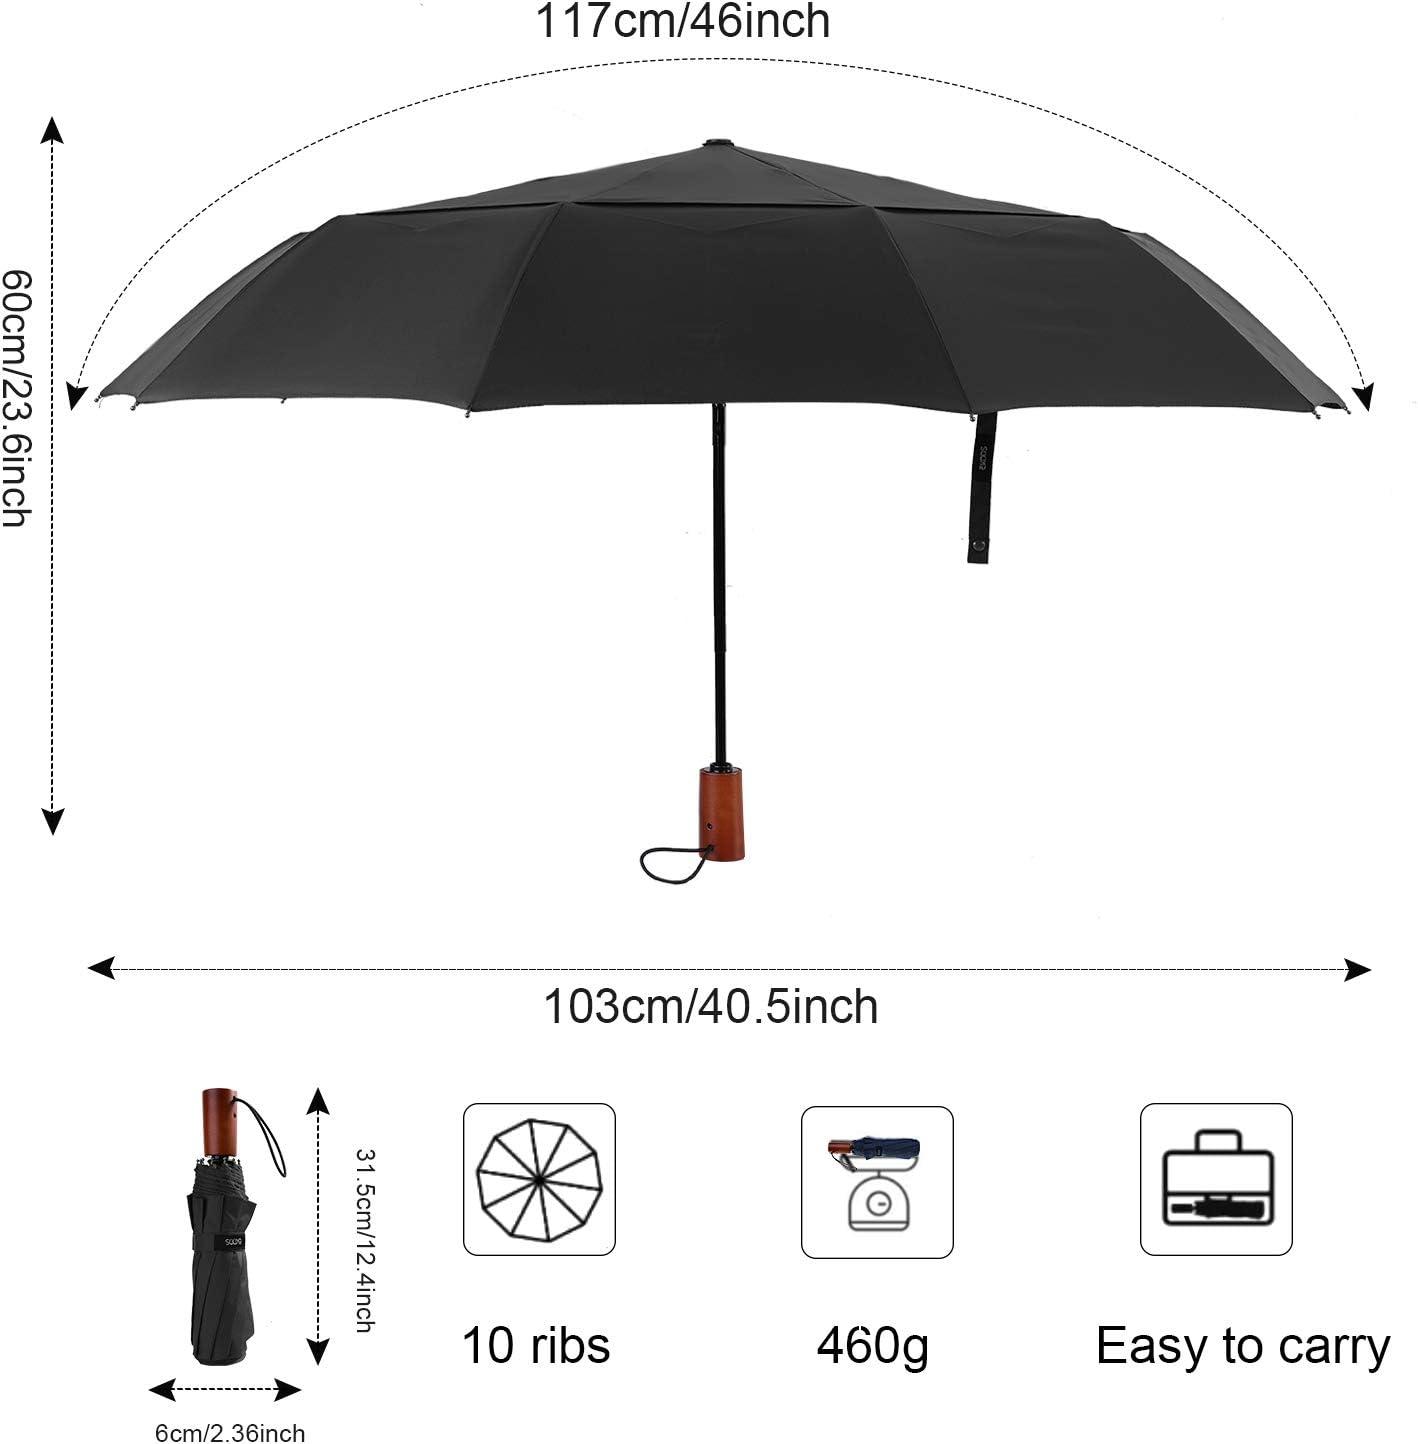 Auto Open//Close Button 10 Rib Wood Handle EKOOS Travel Umbrella Compact Folding Umbrella Large with 40.55 inch Windproof Teflon Coating Double Canopy Construction